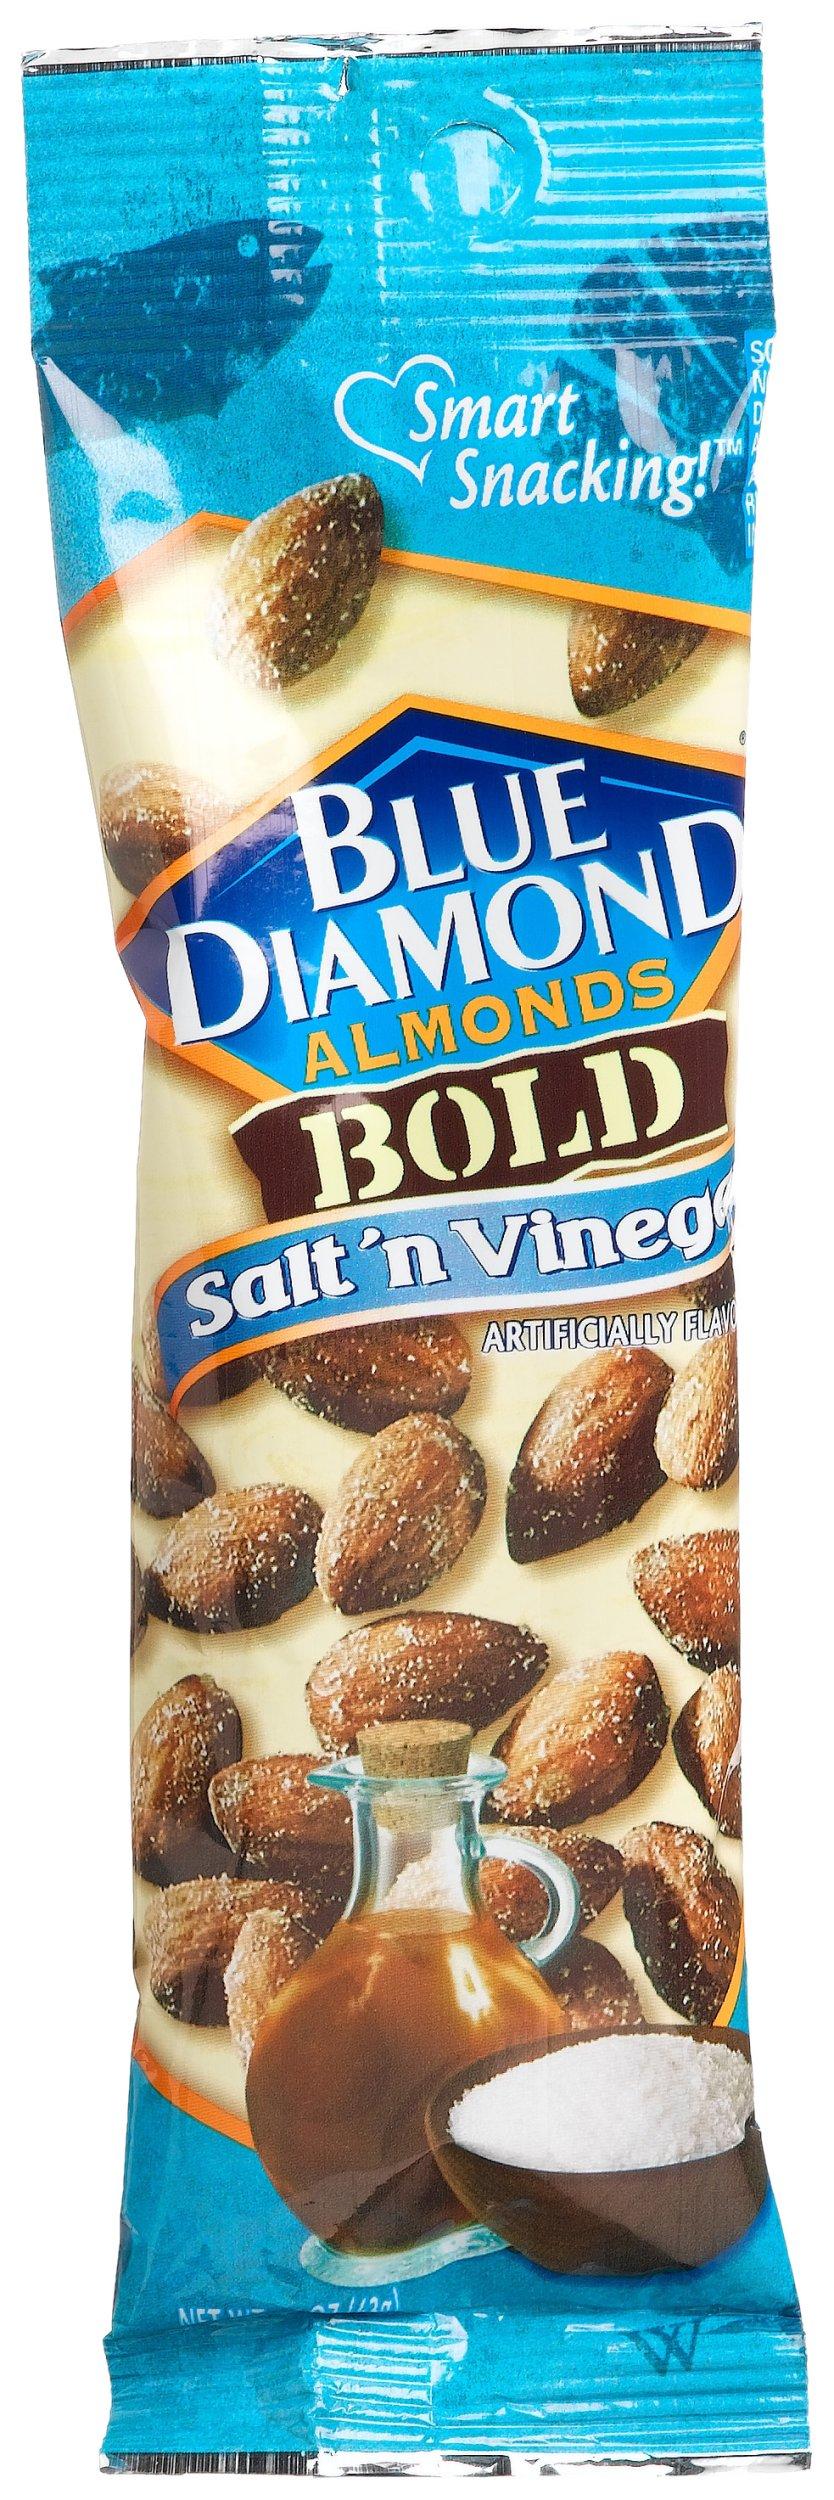 Blue Diamond Almonds, Bold Salt & Vinegar, 1.5 Ounce (Pack of 24) by Blue Diamond Almonds (Image #2)